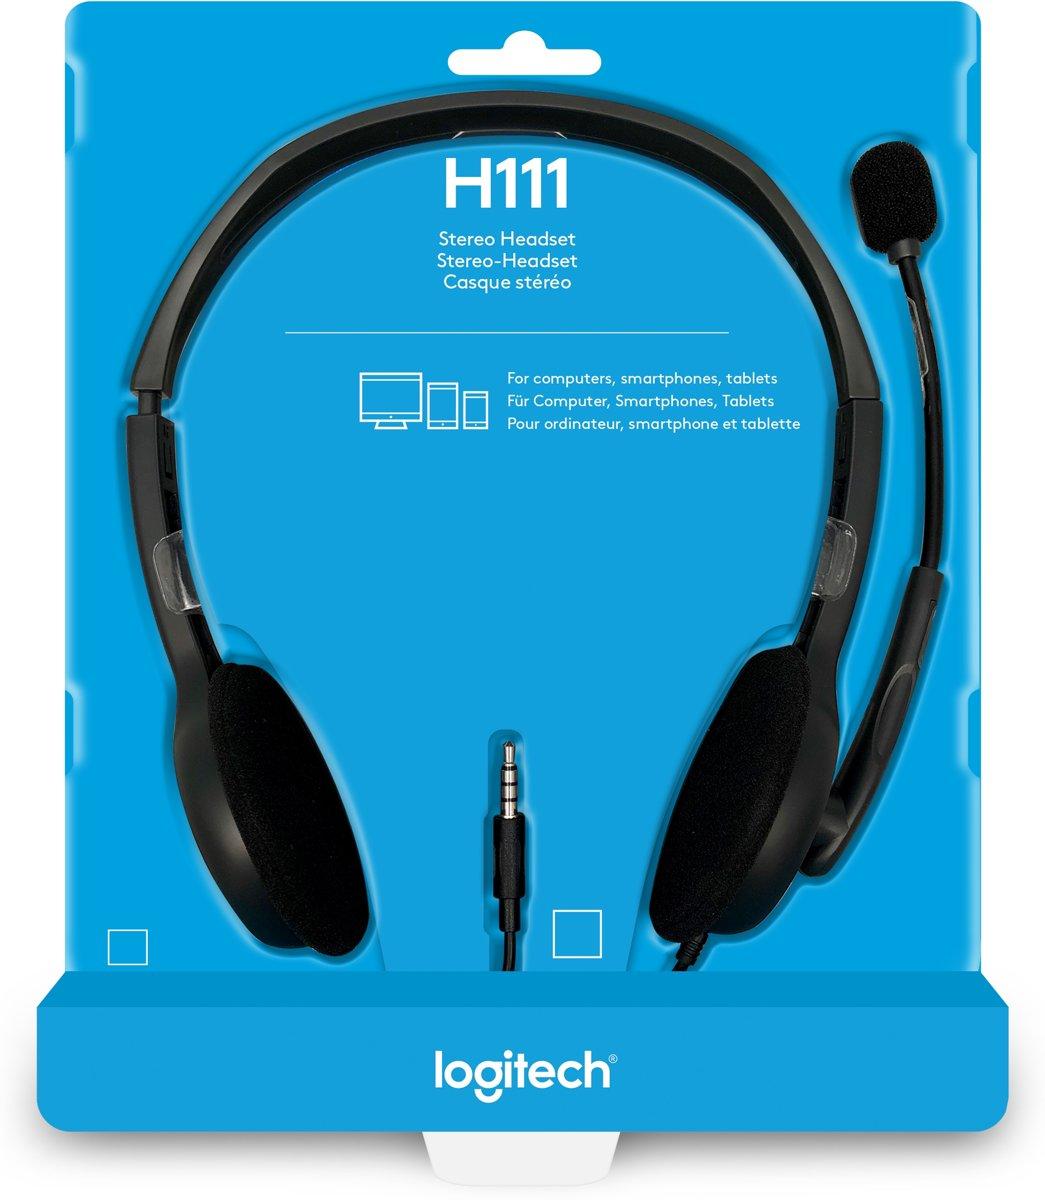 Logitech H111 Stereo Headset H110